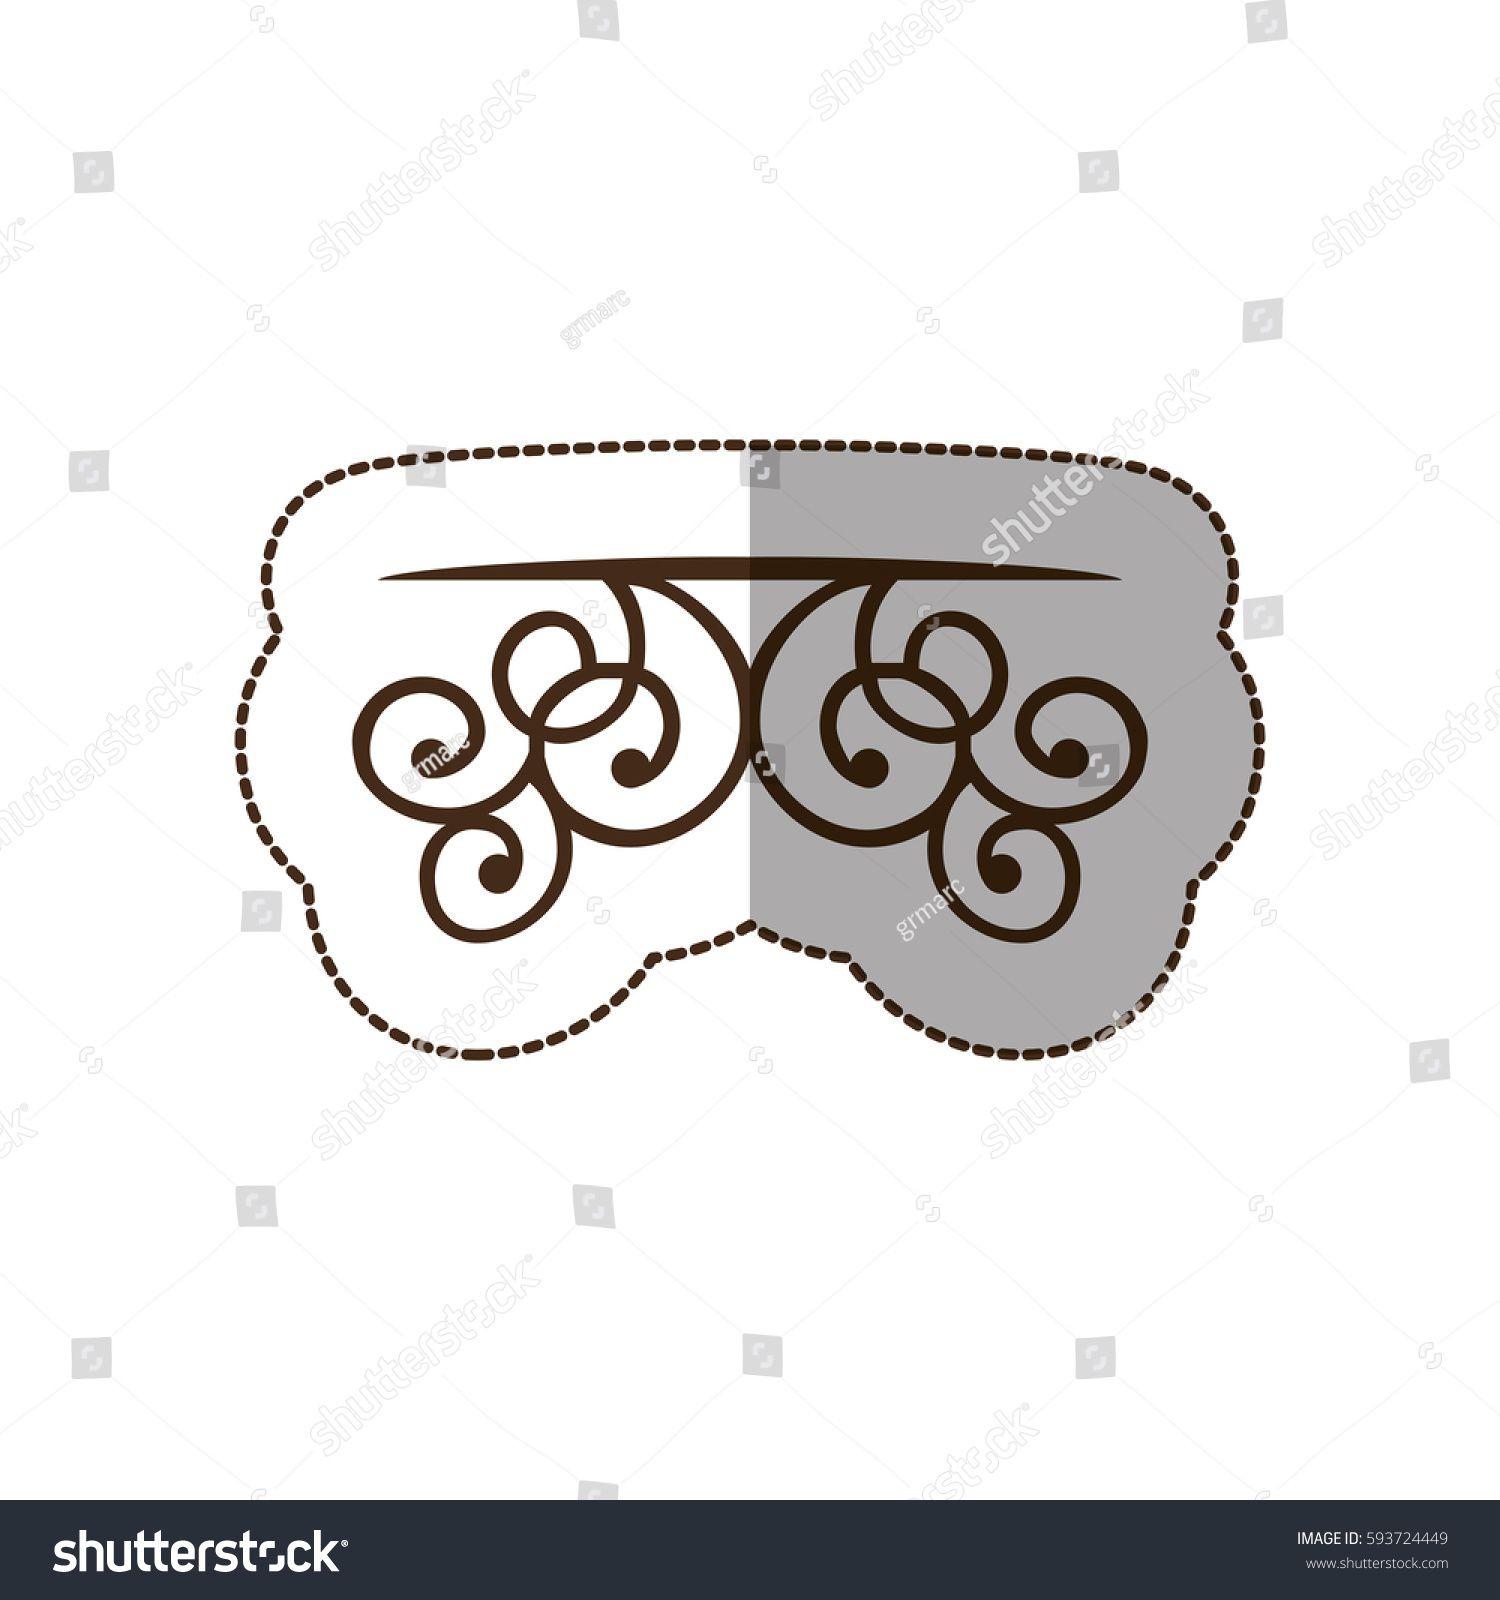 brown decorative swirl shelf icon, vector illustraction